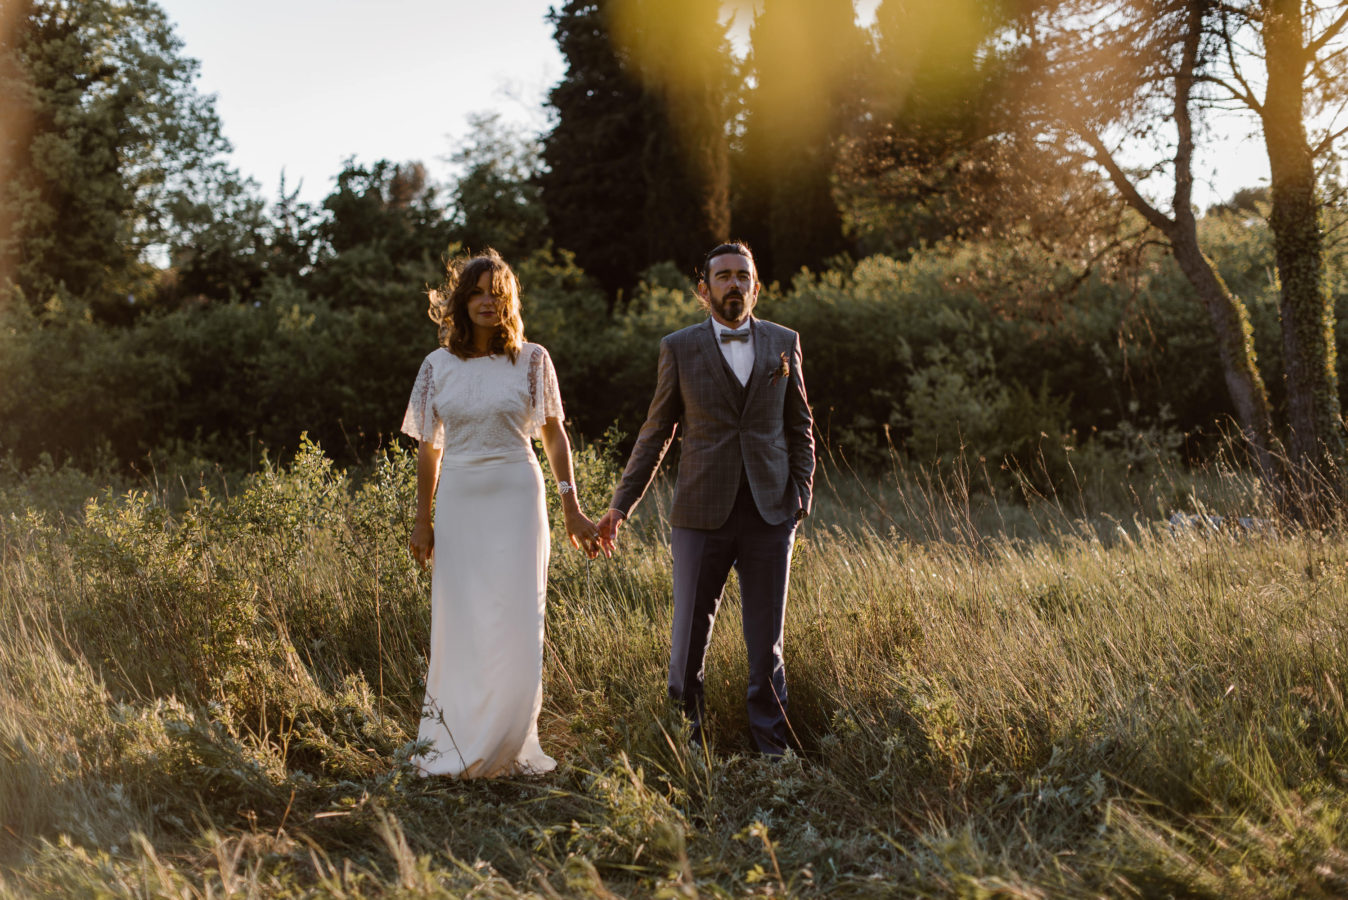 mariage-provence-nature-champetre-nice-priscilliahervier-photographe-205_mini